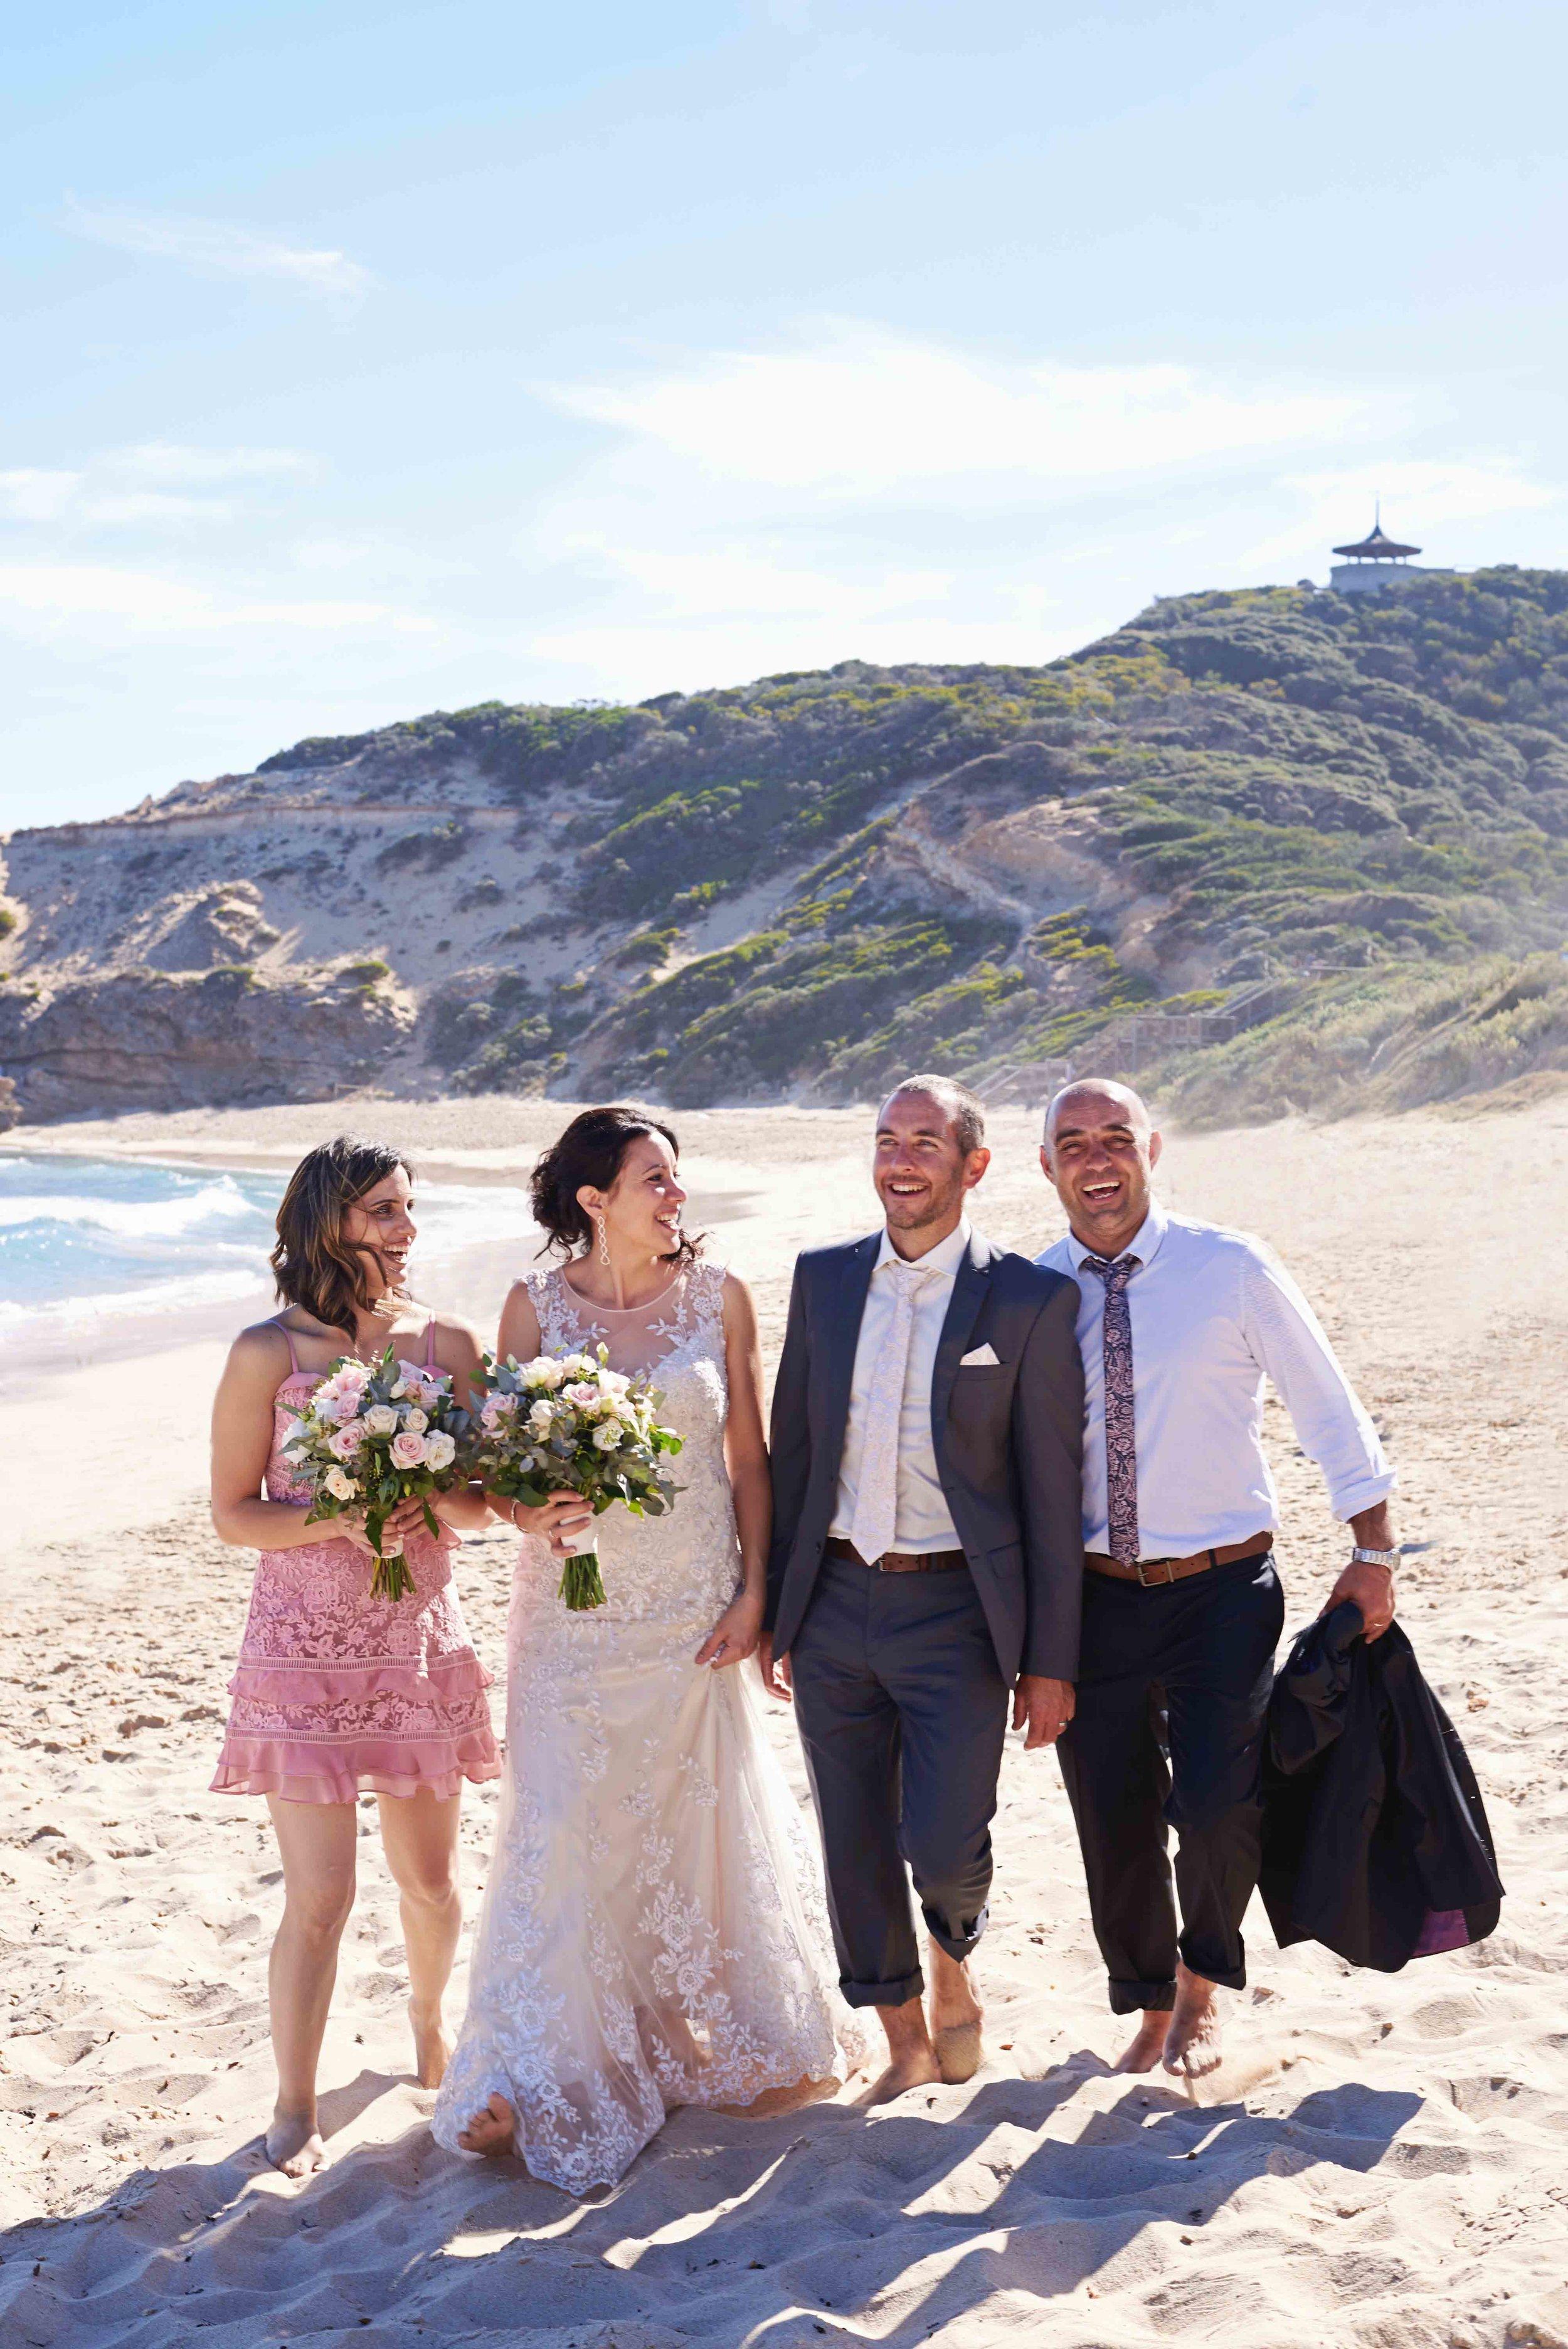 sorrento-wedding-photography-all-smiles-marissa-jade-photography-124.jpg